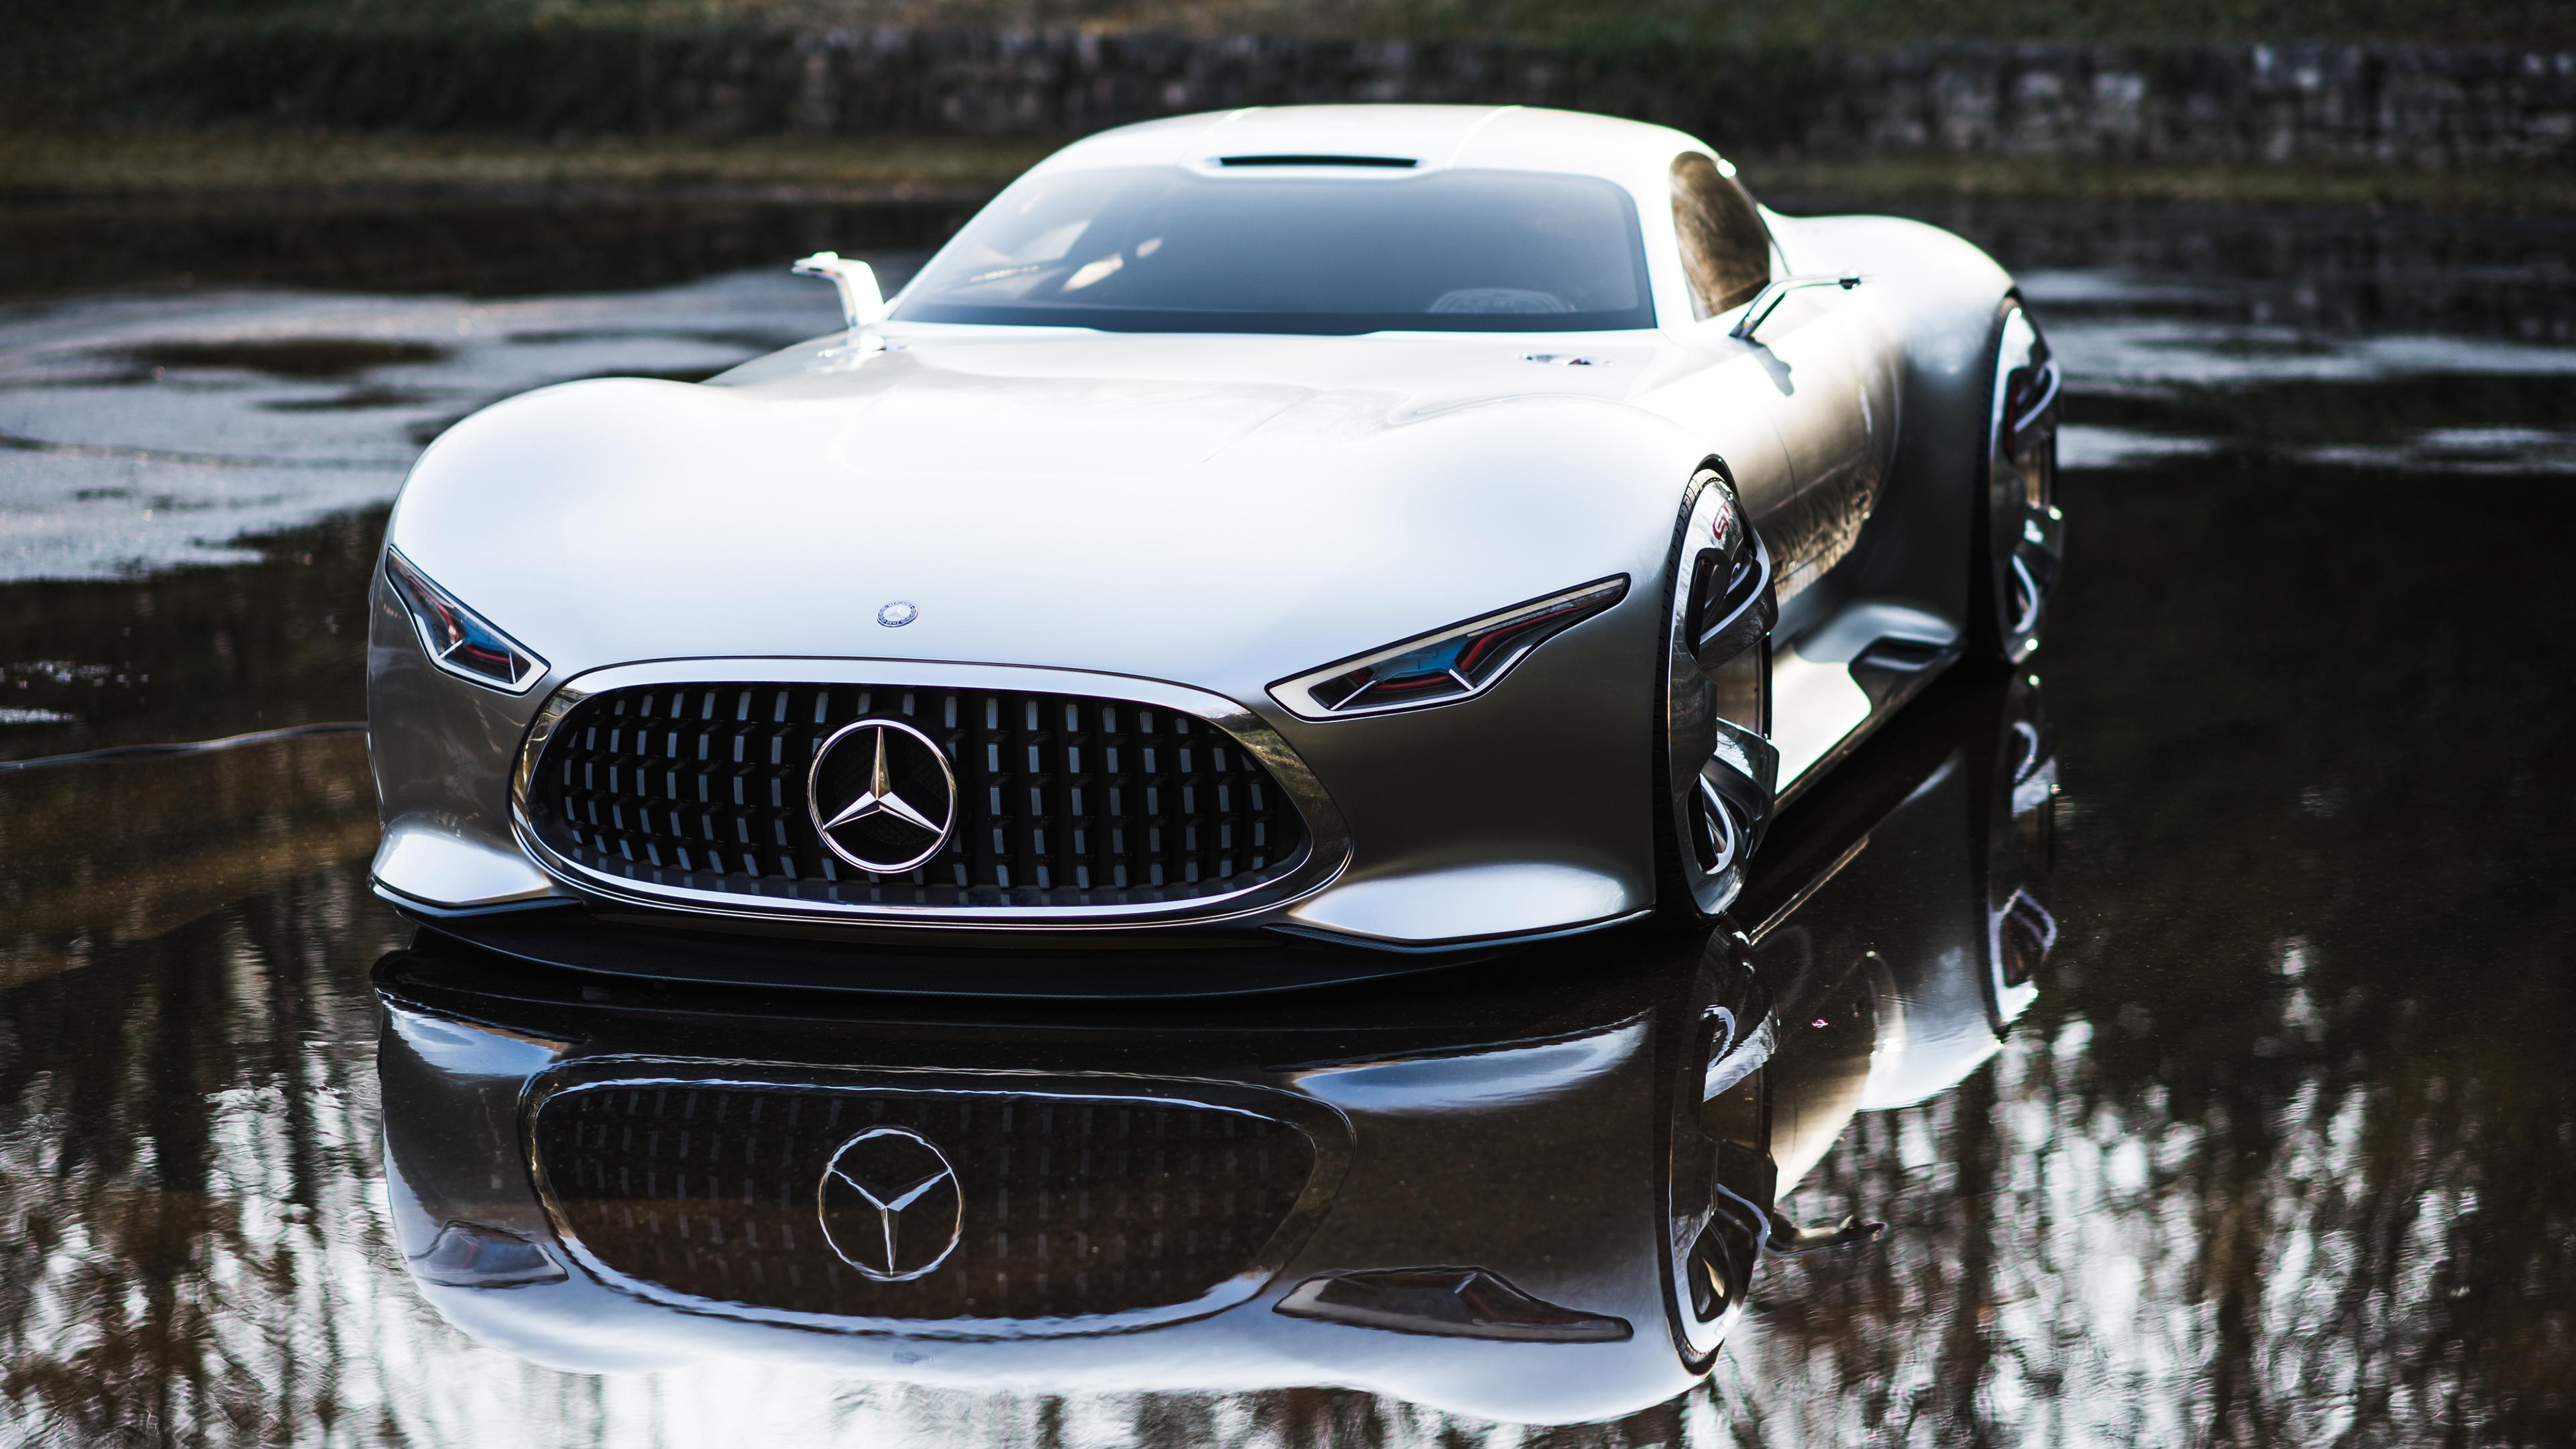 mercedes benz amg vision gran turismo front 4k 1546361548 - Mercedes Benz AMG Vision Gran Turismo Front 4k - mercedes benz wallpapers, hd-wallpapers, cars wallpapers, behance wallpapers, 4k-wallpapers